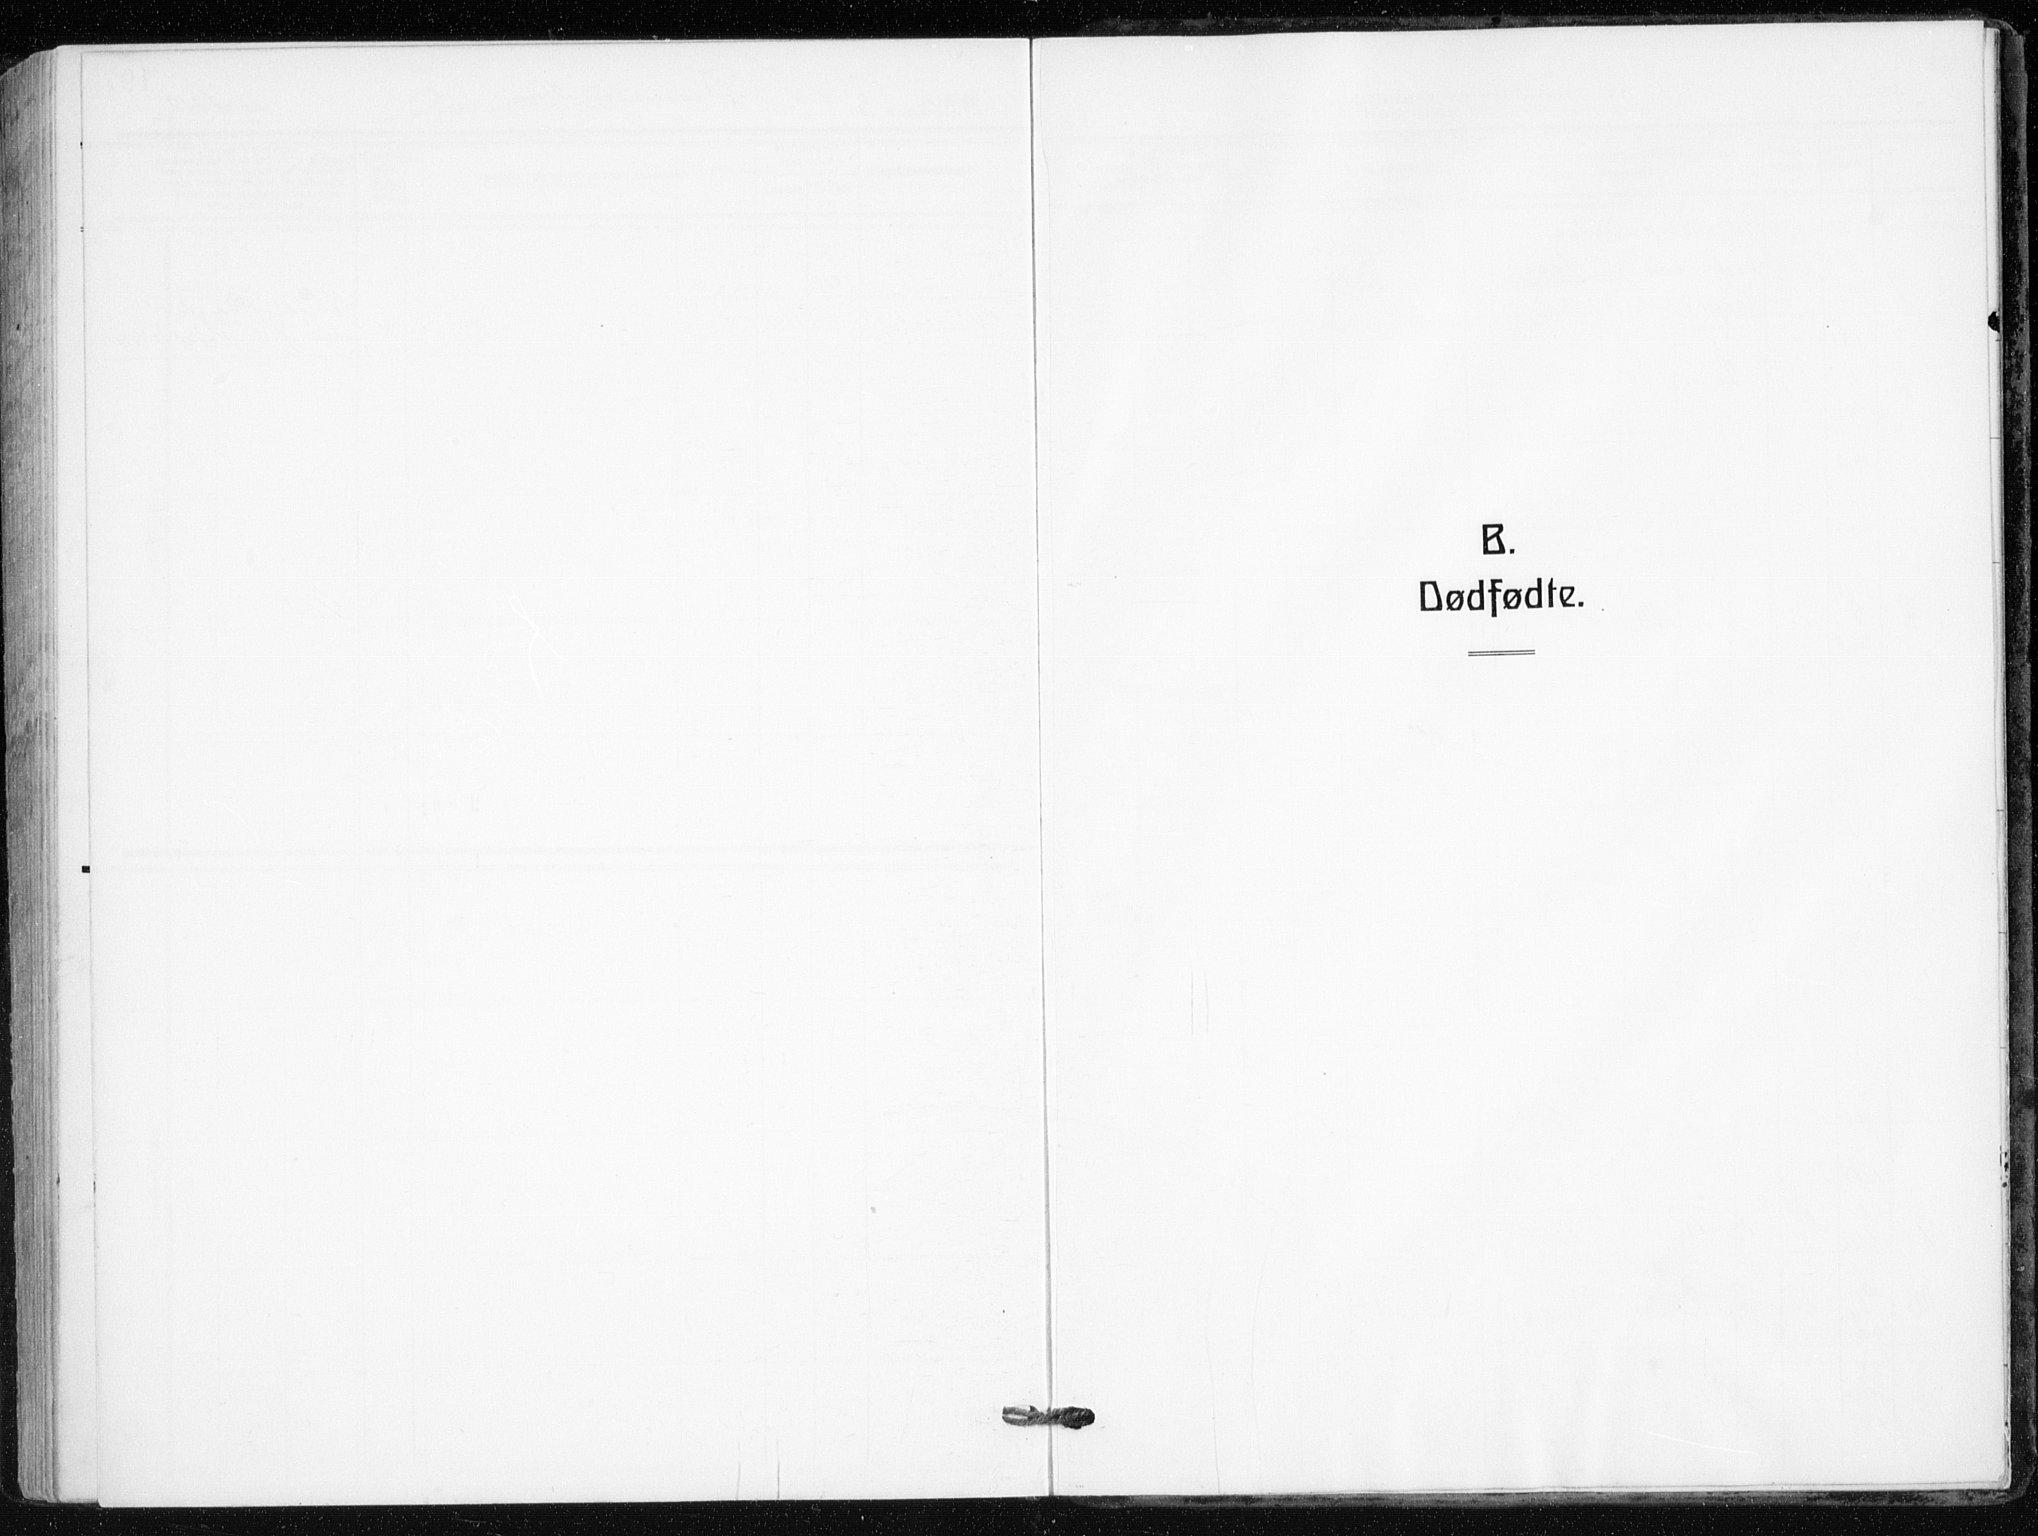 SAO, Kampen prestekontor Kirkebøker, F/Fa/L0012: Parish register (official) no. I 12, 1916-1921